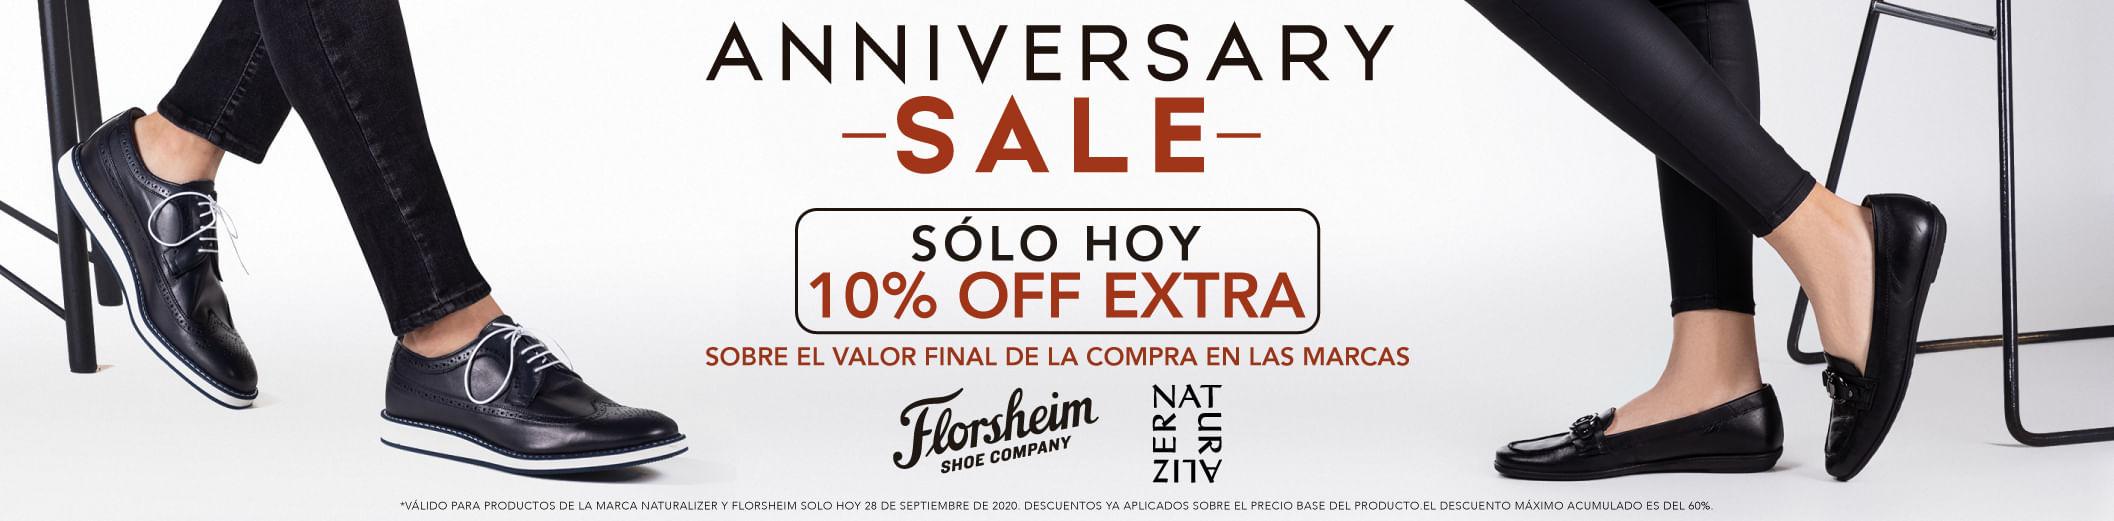 Anniversary Sale Freeport